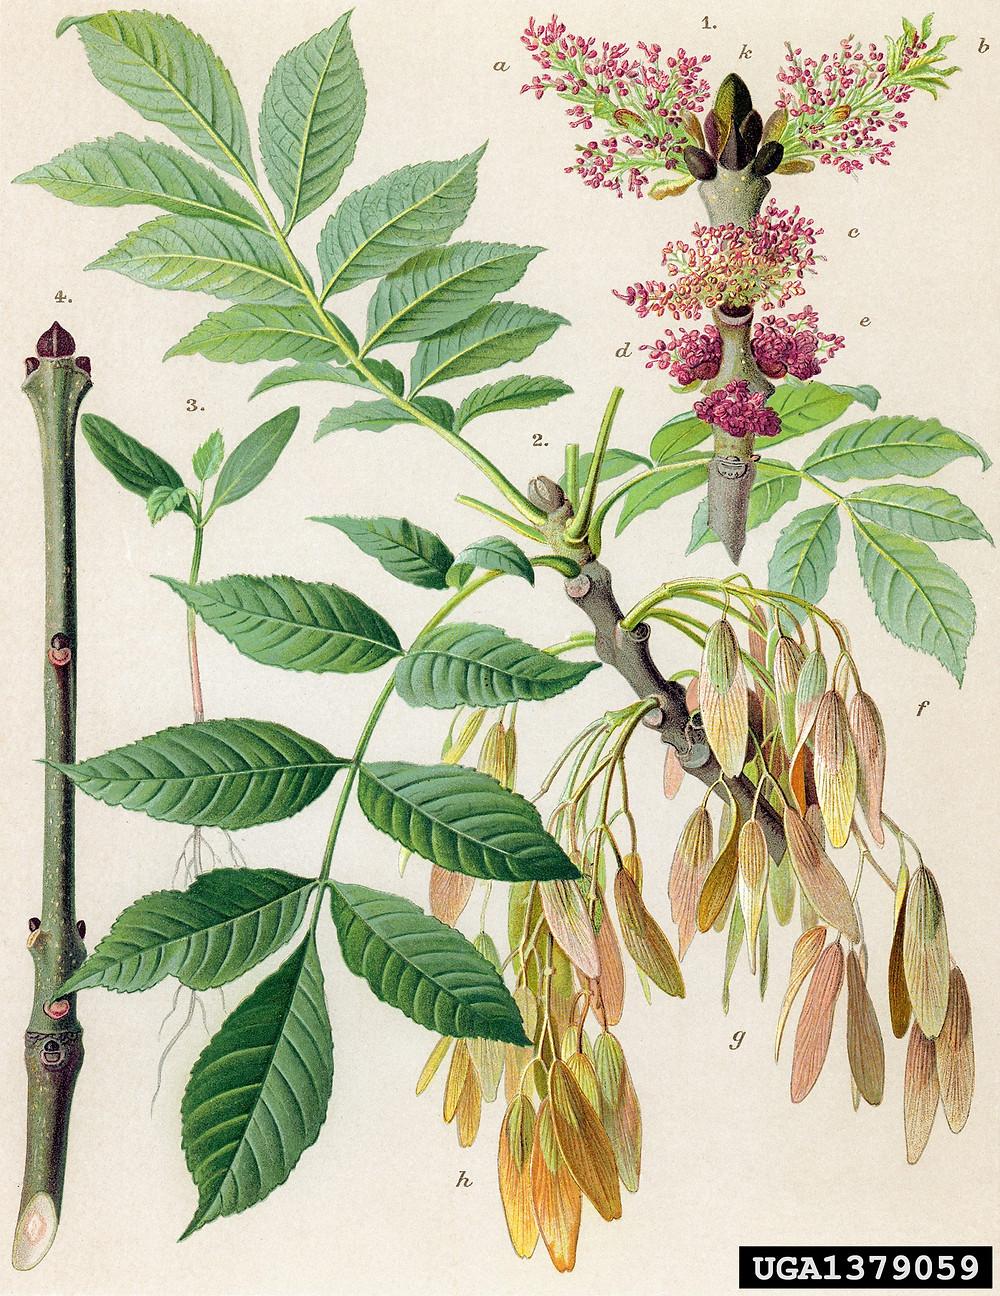 Illustration of Common Ash Tree, European Ash Tree, Fraxinus excelsior